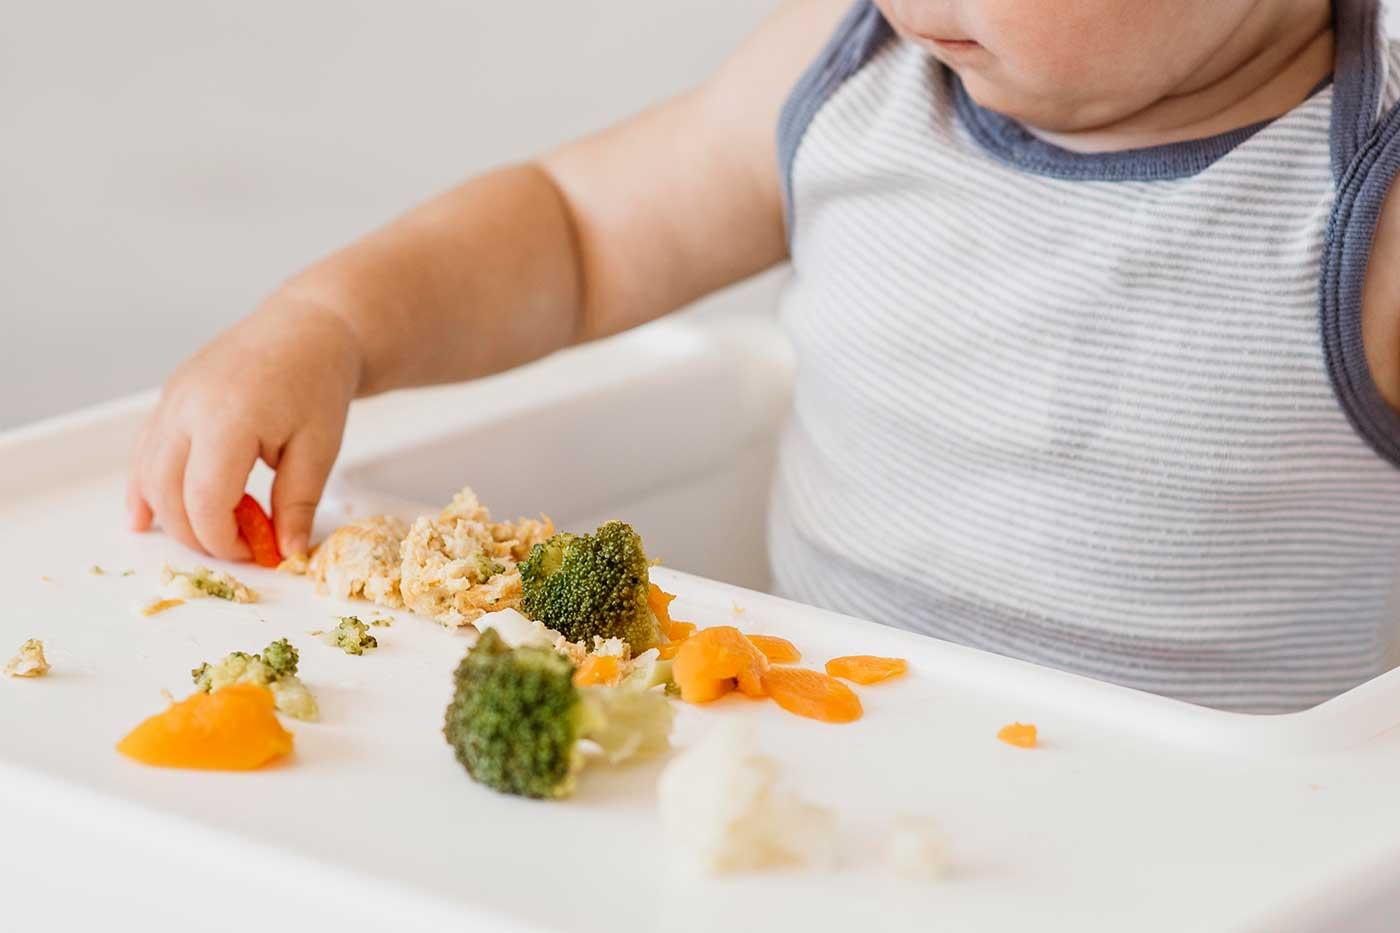 cute-baby-boy-highchair-choosing-what-eat-1400